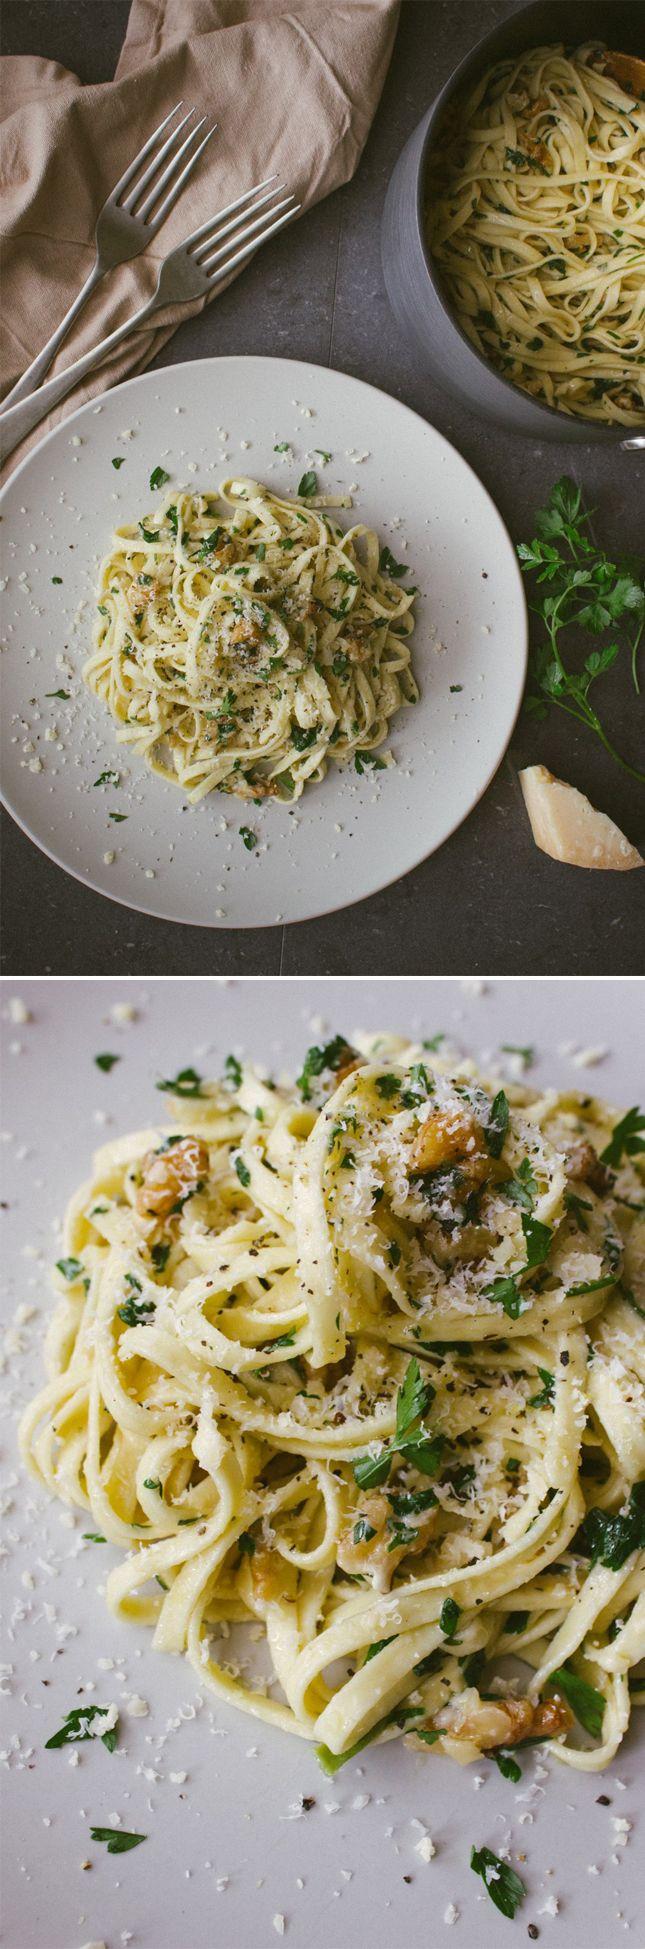 Walnut, Parsley, and Parmesan Linguine | mmmmhmmm | Pinterest